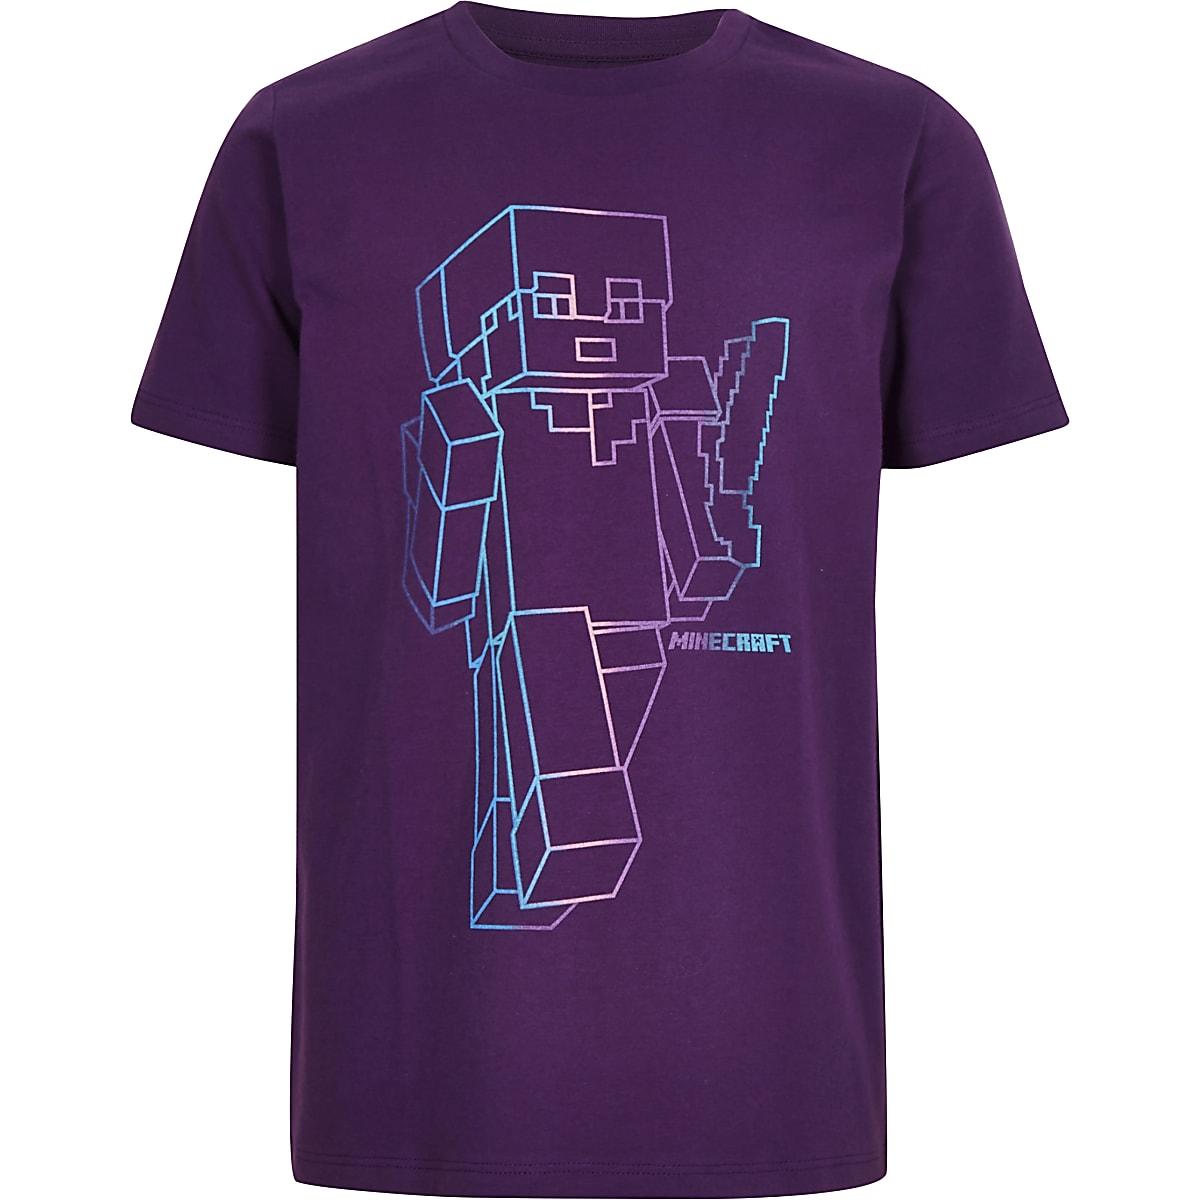 Minecraft – T-Shirt in Lila